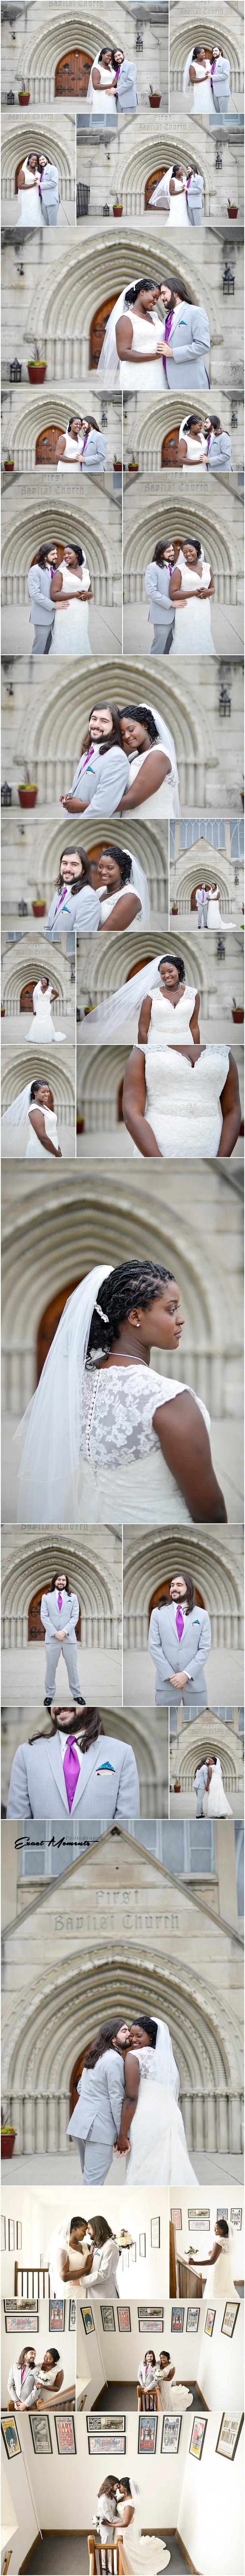 The Bluestone Columbus Ohio Wedding Photography